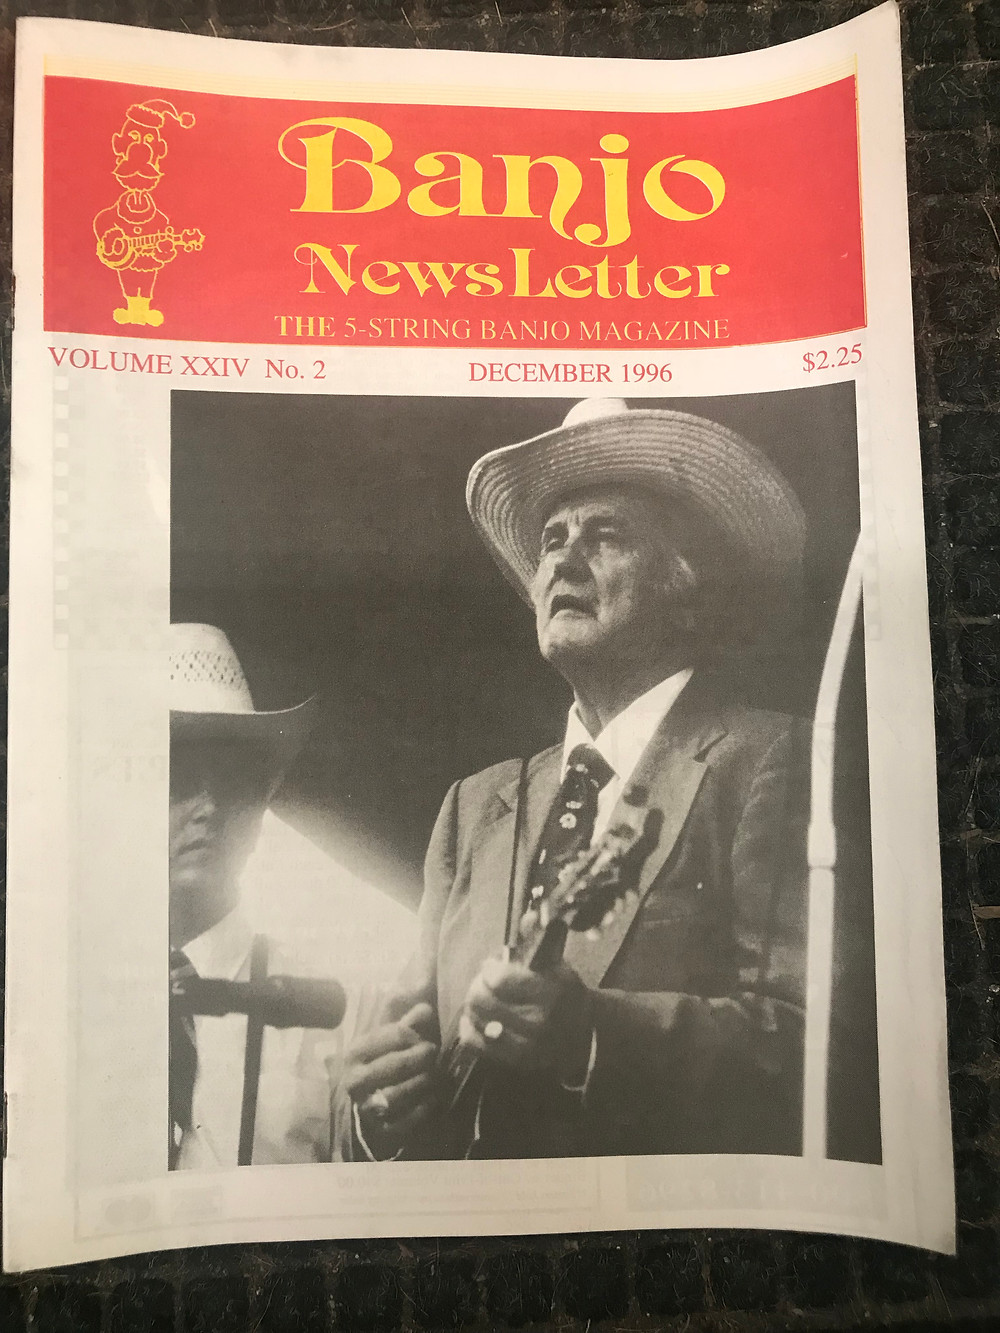 Banjo Bill Monroe